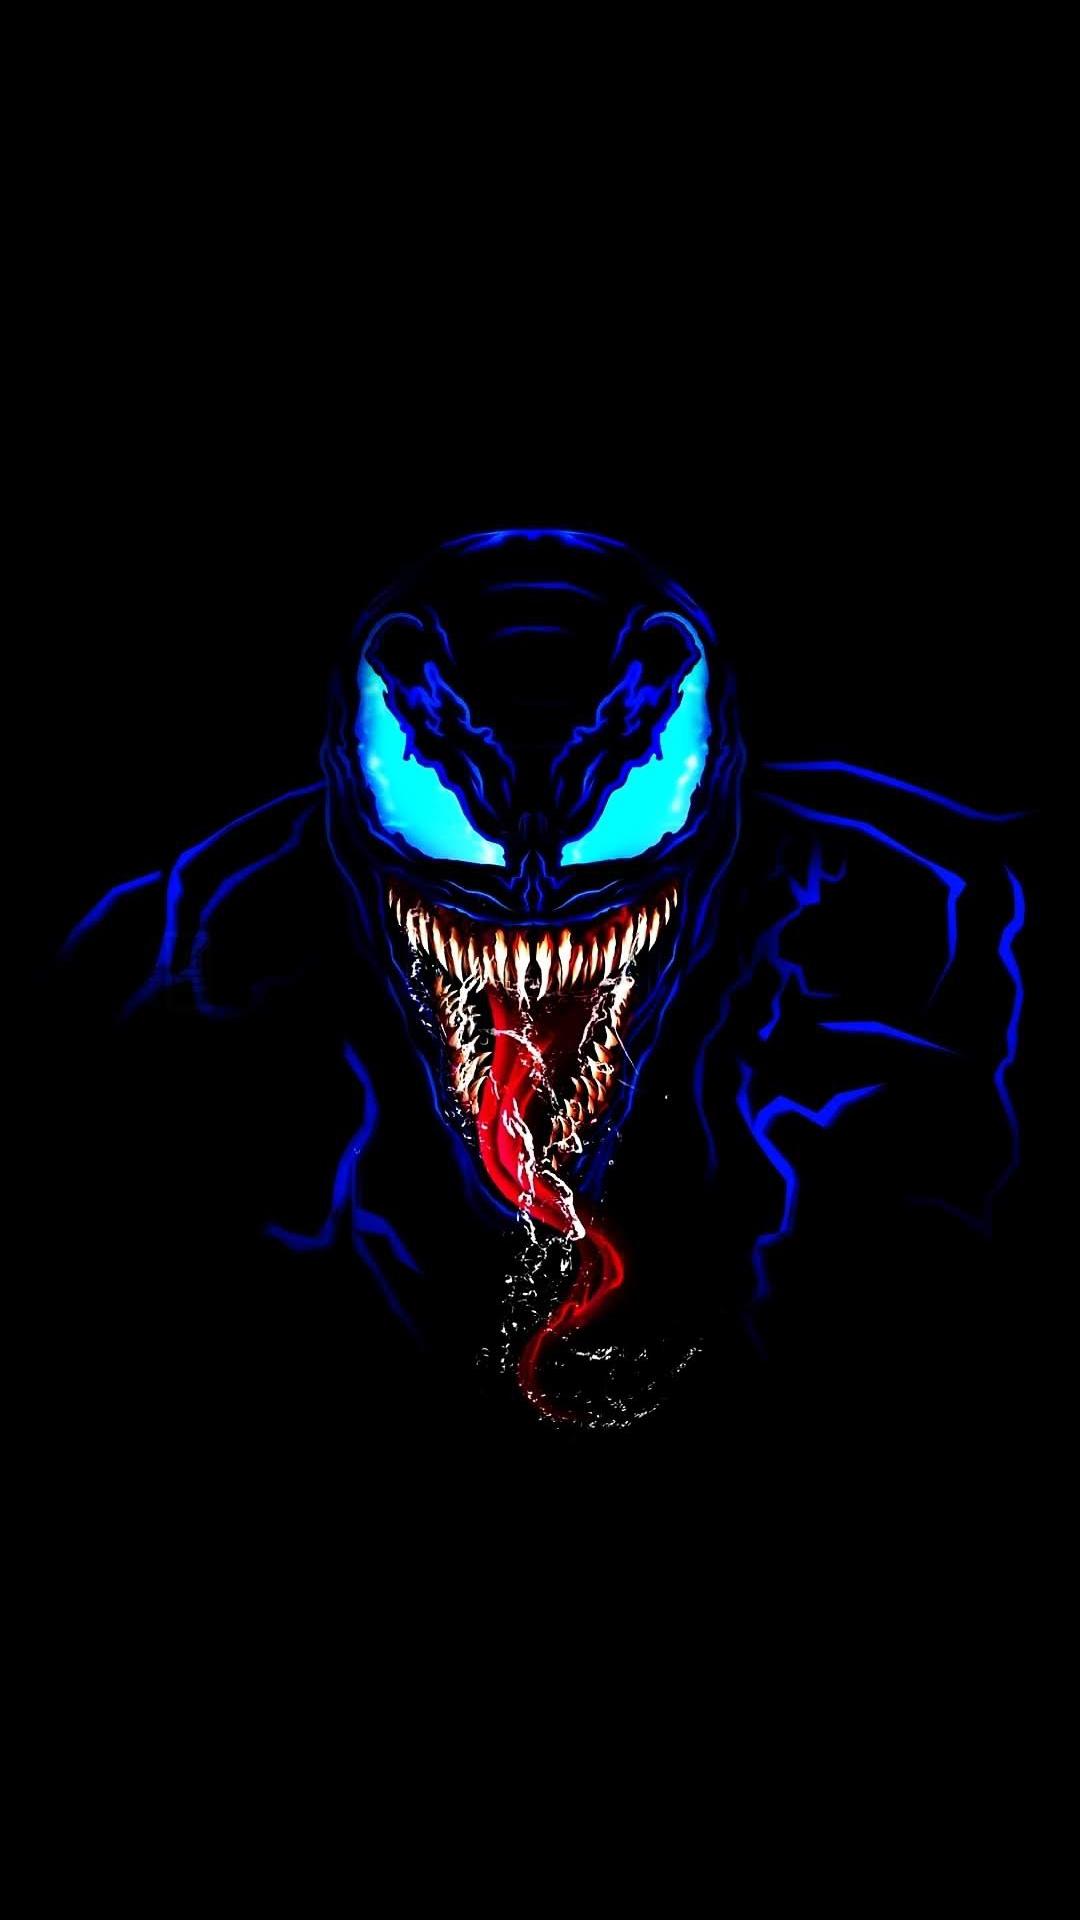 The Godfather Iphone Wallpaper Venom In Dark Iphone Wallpaper Iphone Wallpapers